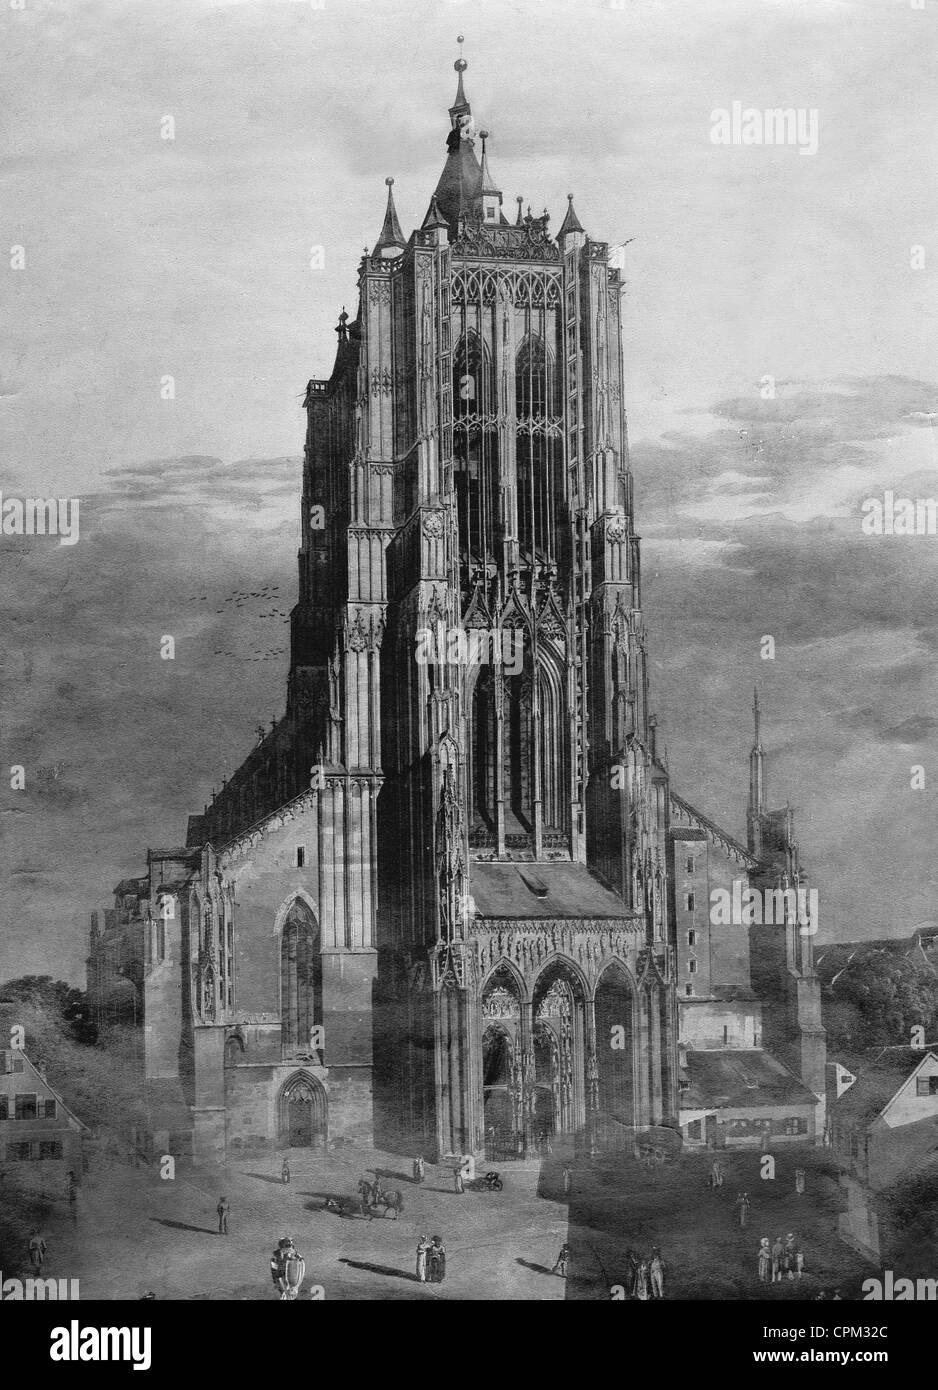 Dans Ulm Minster, vers 1800 Banque D'Images